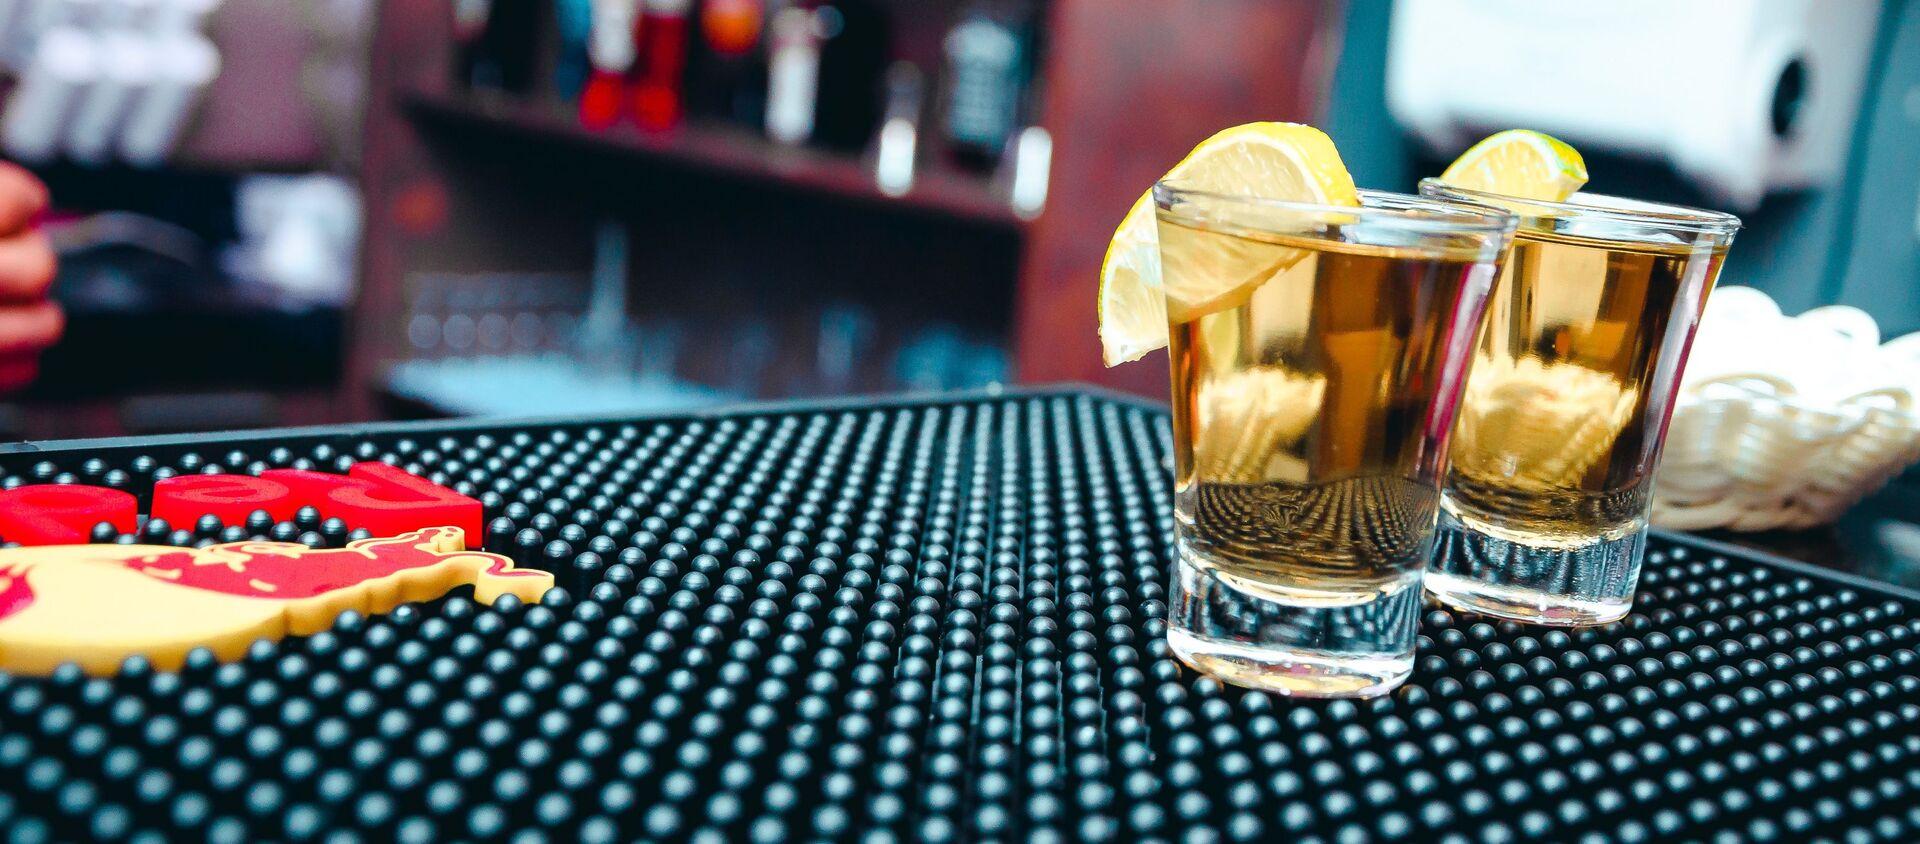 Tequila (imagen referencial) - Sputnik Mundo, 1920, 10.12.2020